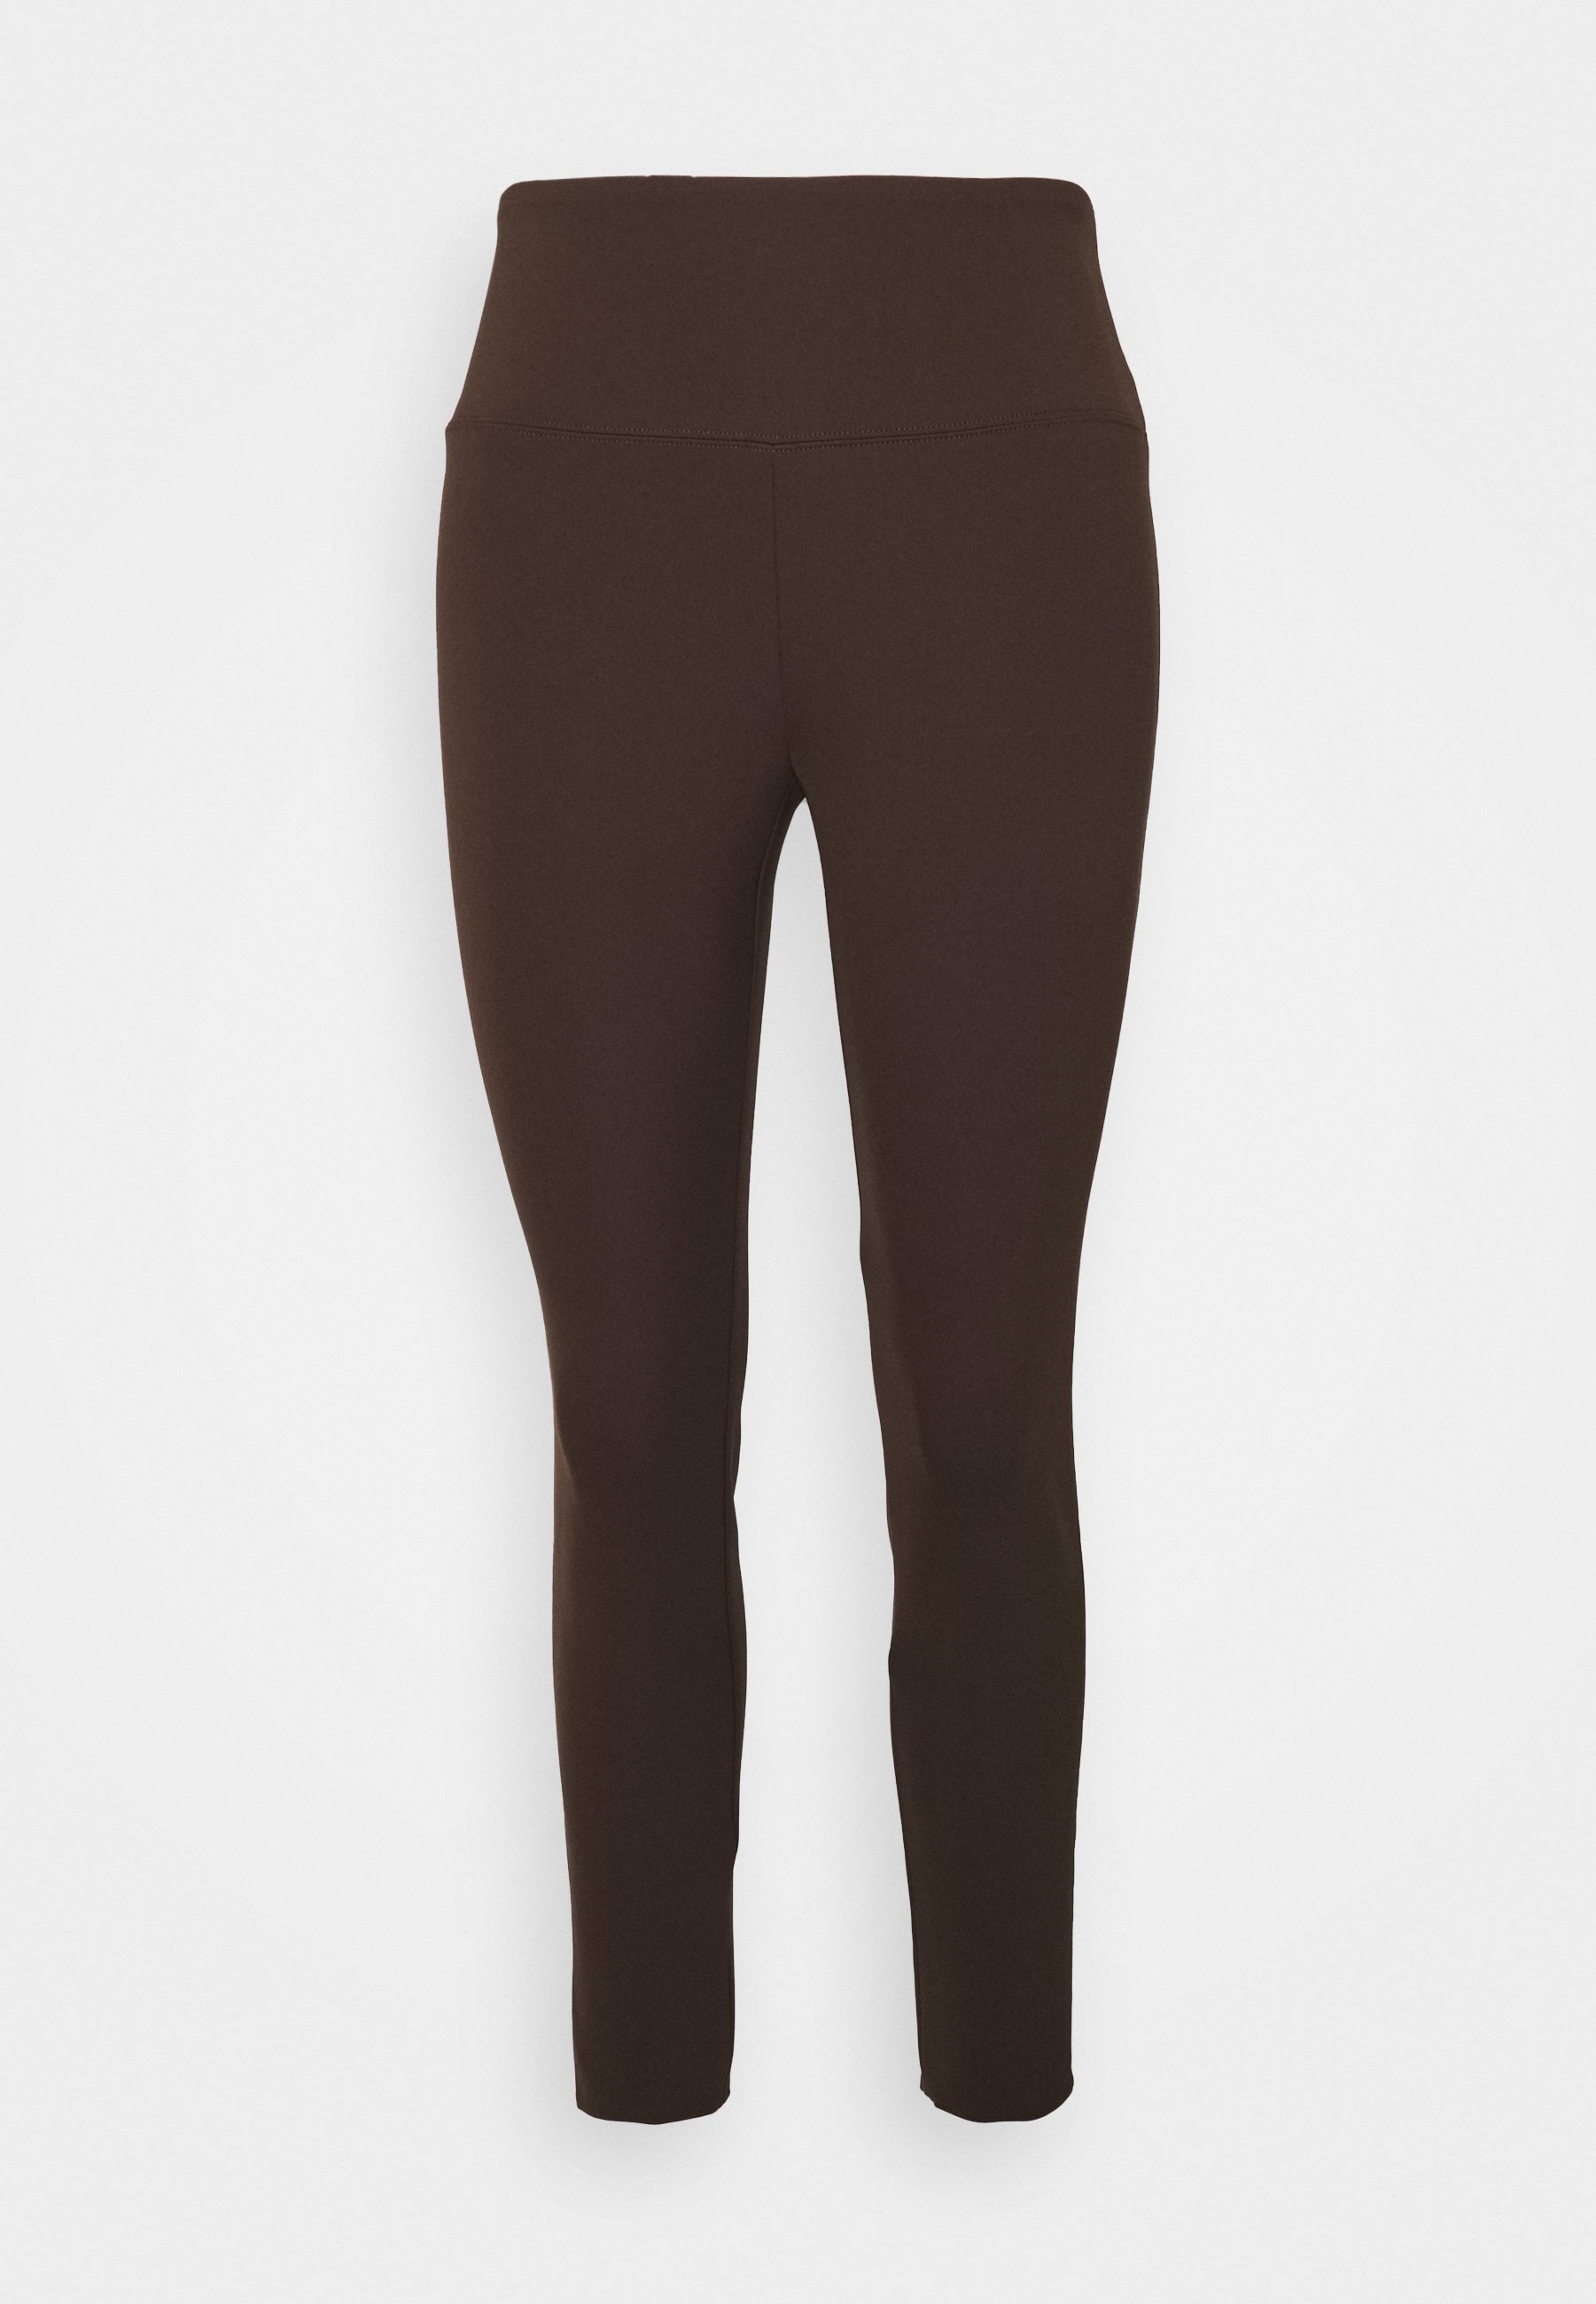 Damen YOKE CORE - Leggings - Hosen